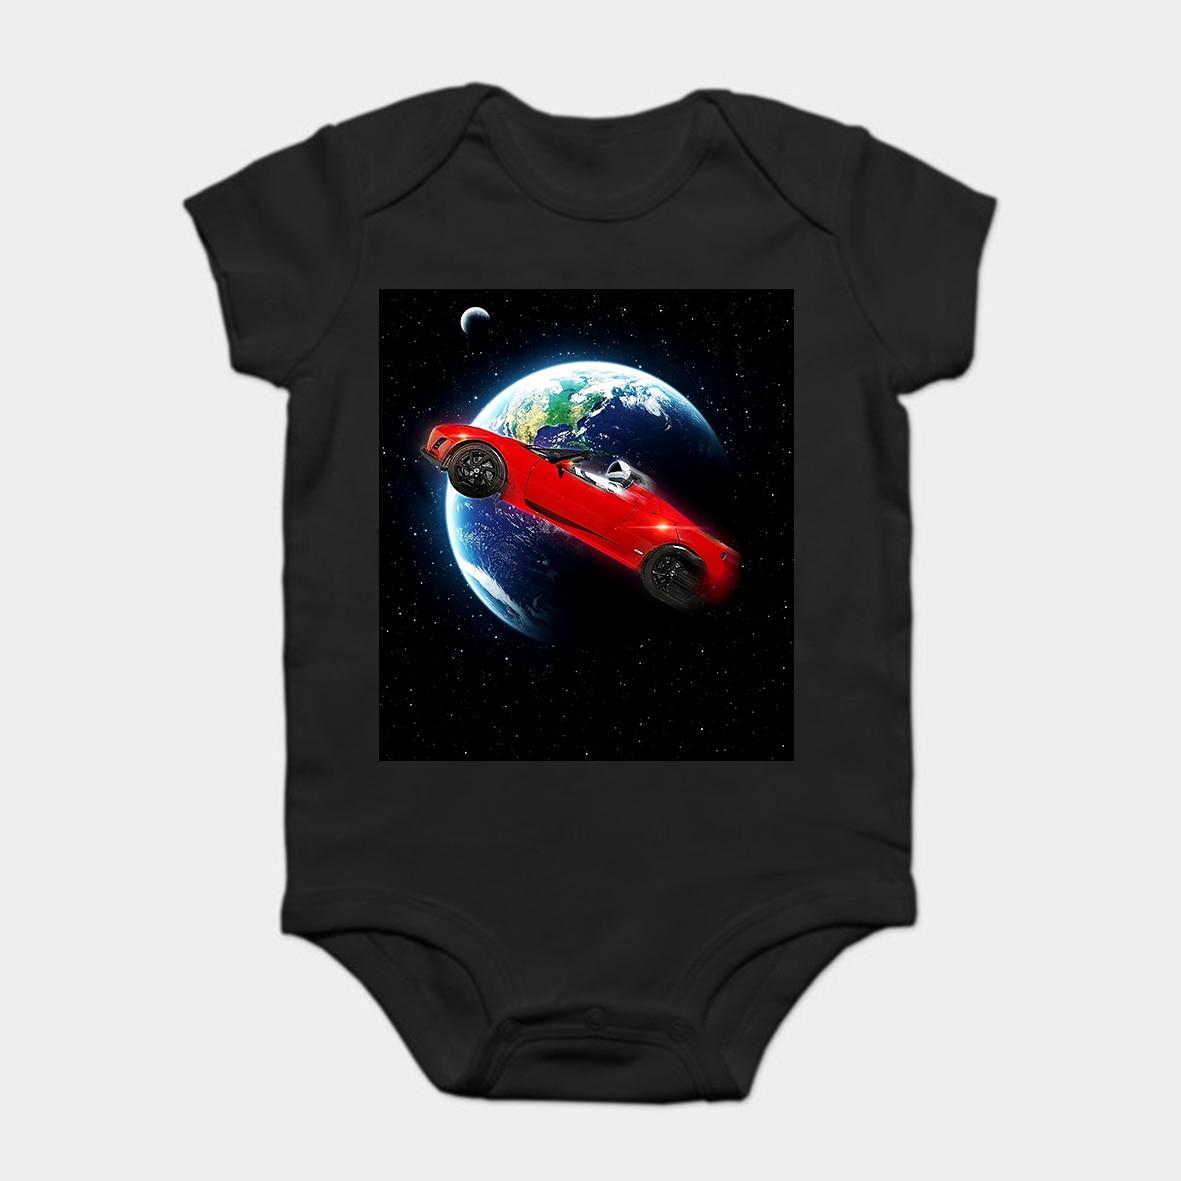 Dedicated Baby Onesie Baby Bodysuits Kid T Shirt Funny Novelty Spacex Roadster Elon Musk Tesla Falcon Heavy